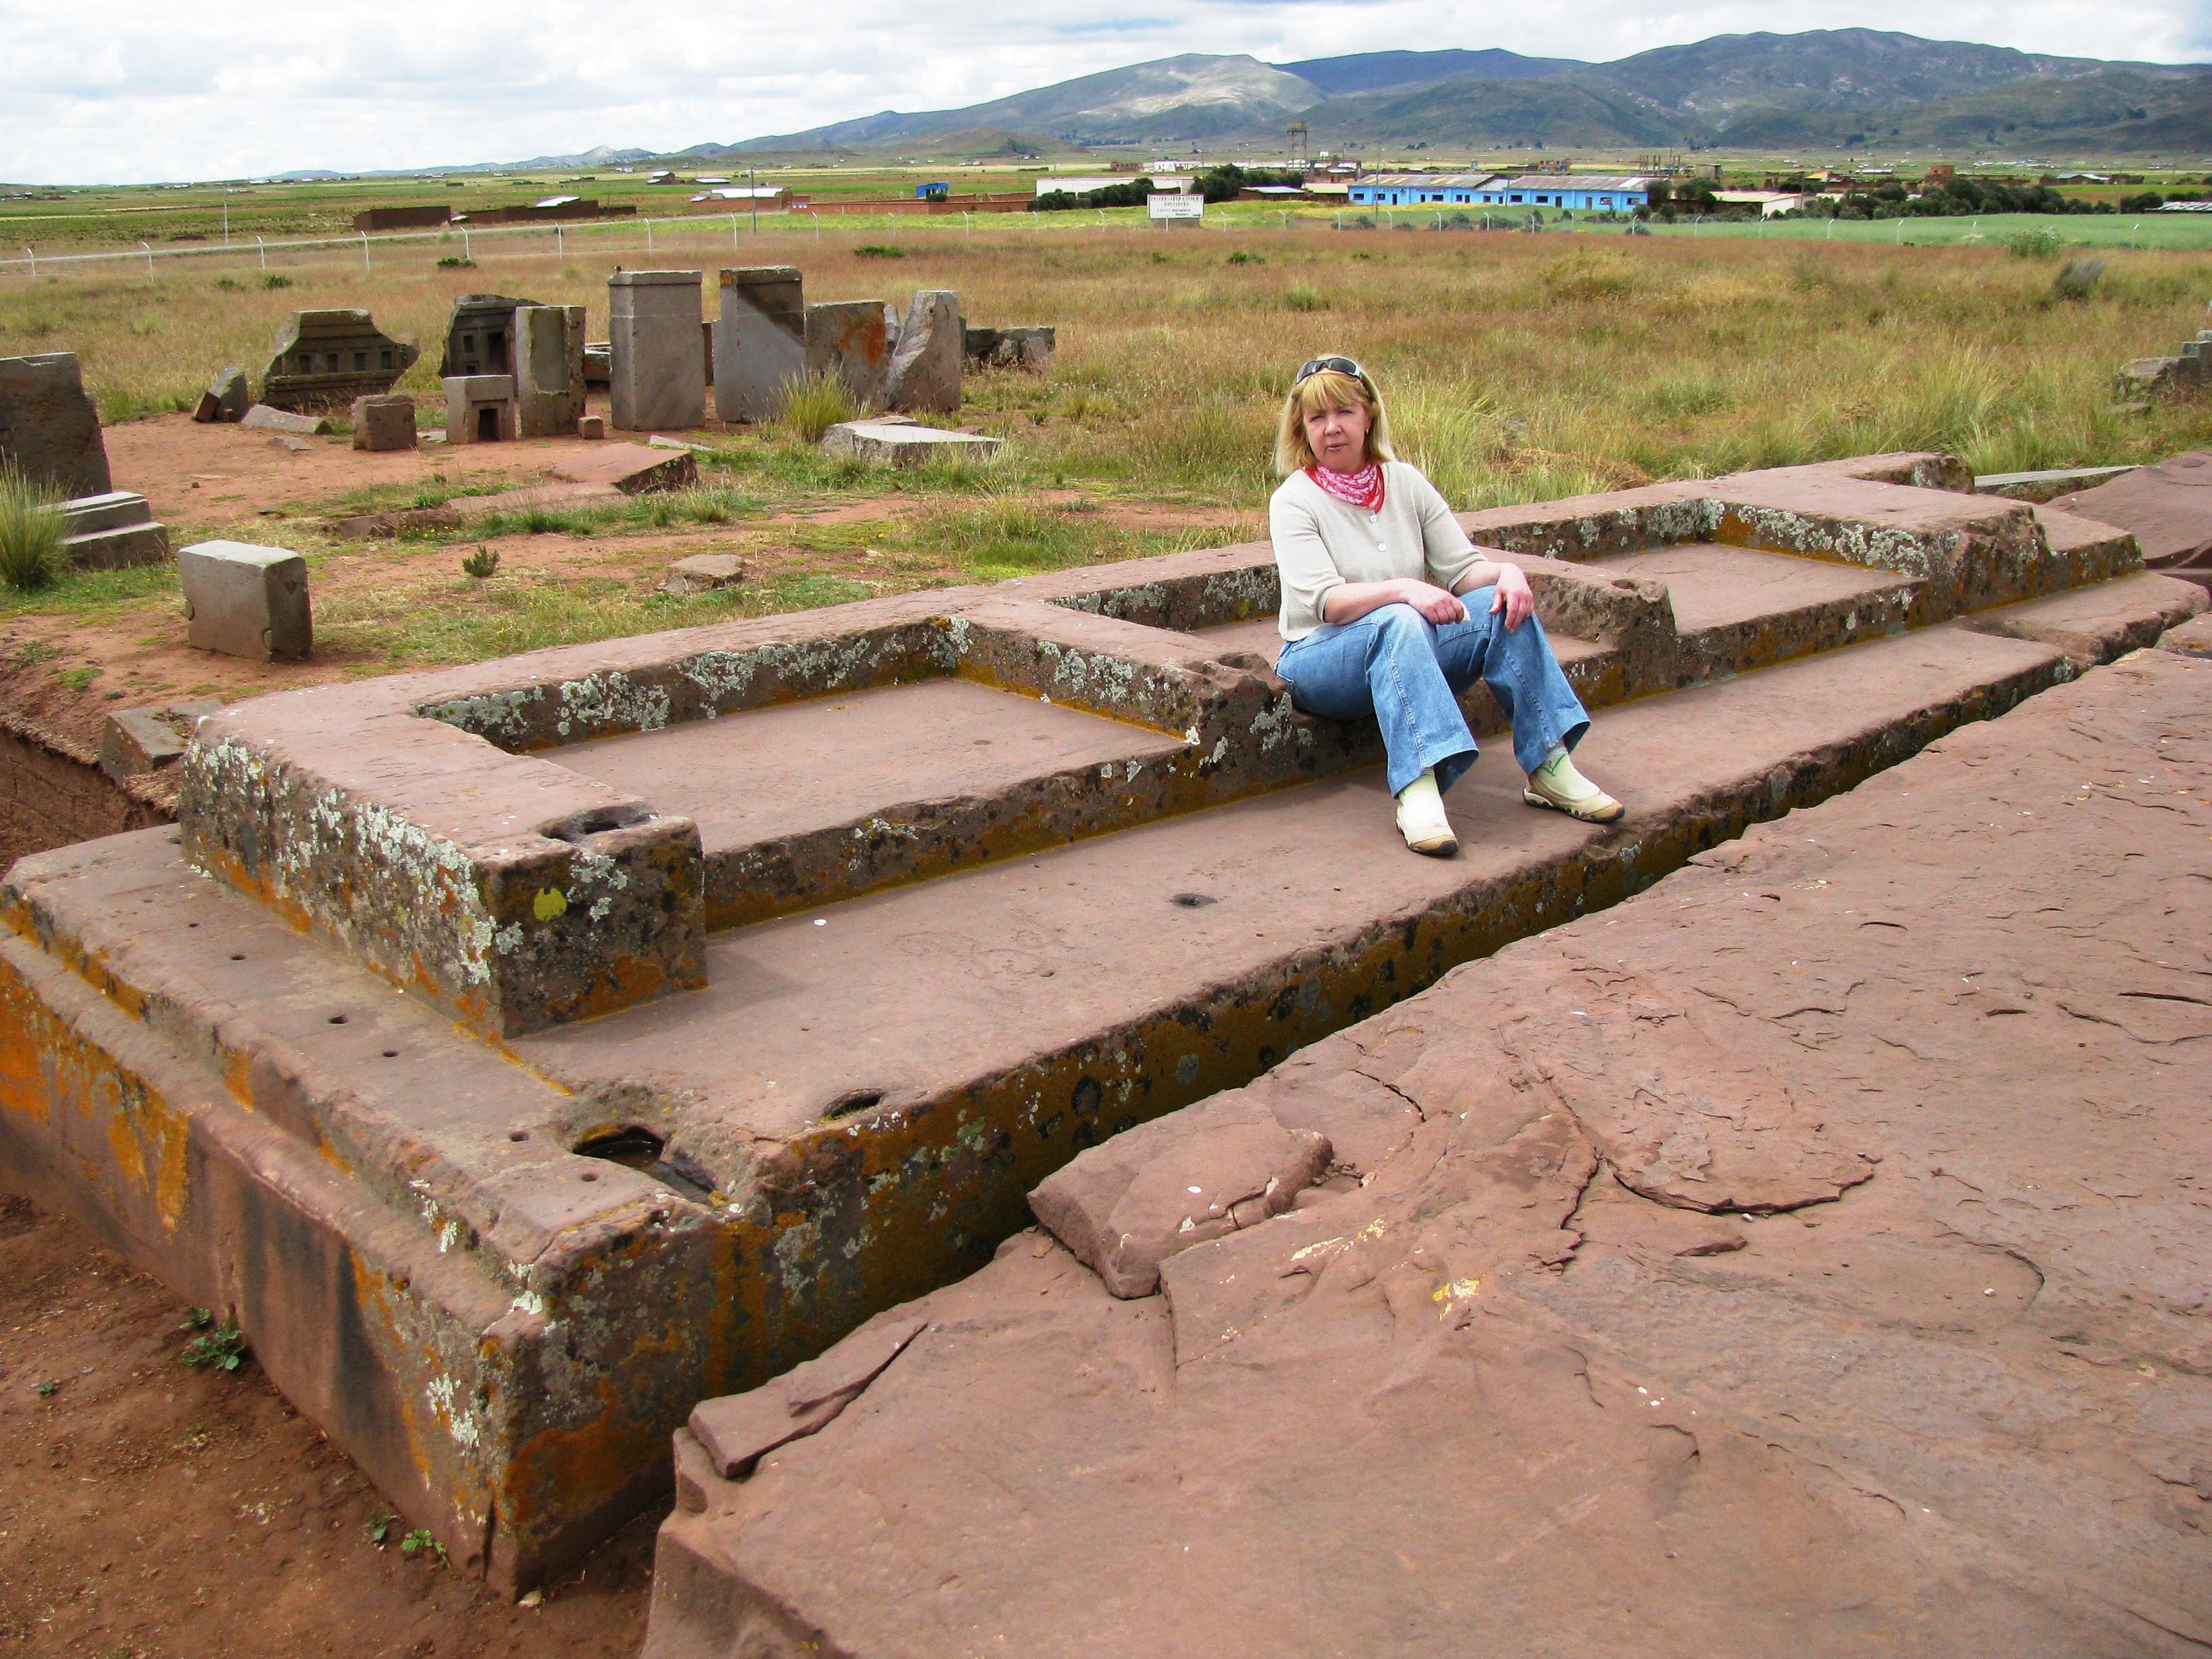 Megalithic platform at Puma Punku